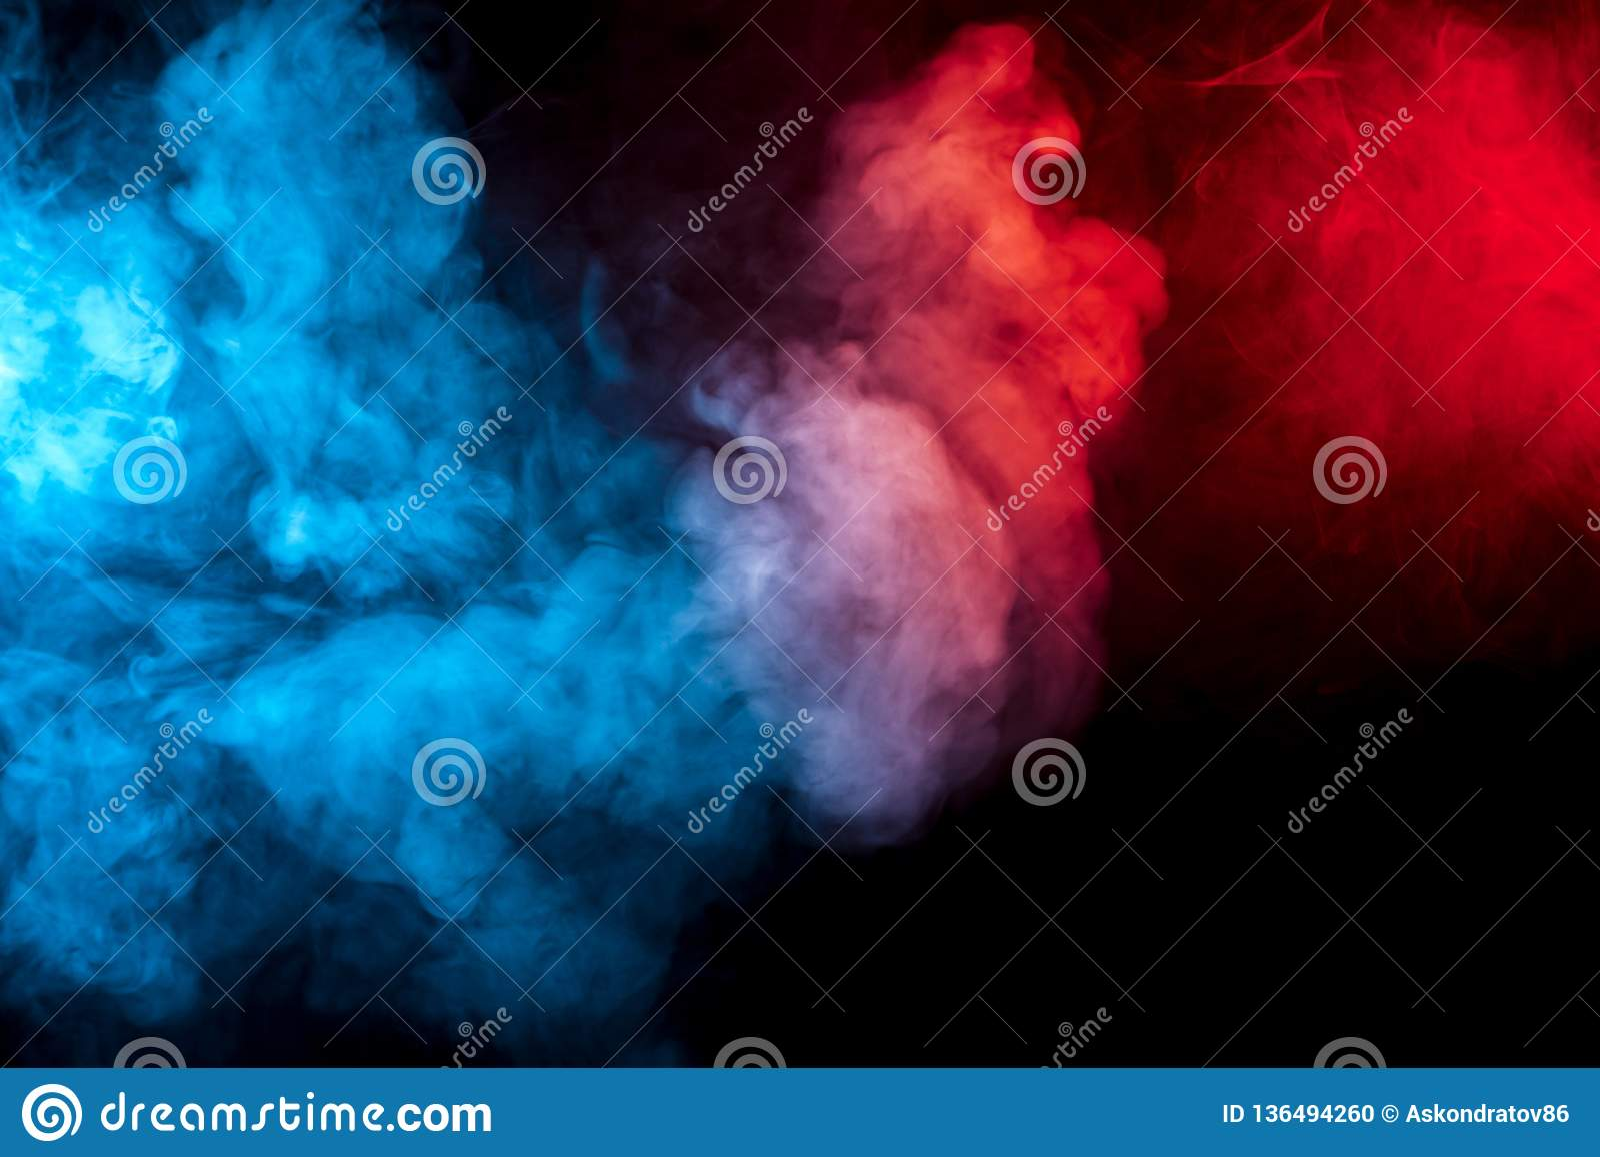 isolement bleu rouge orange rose